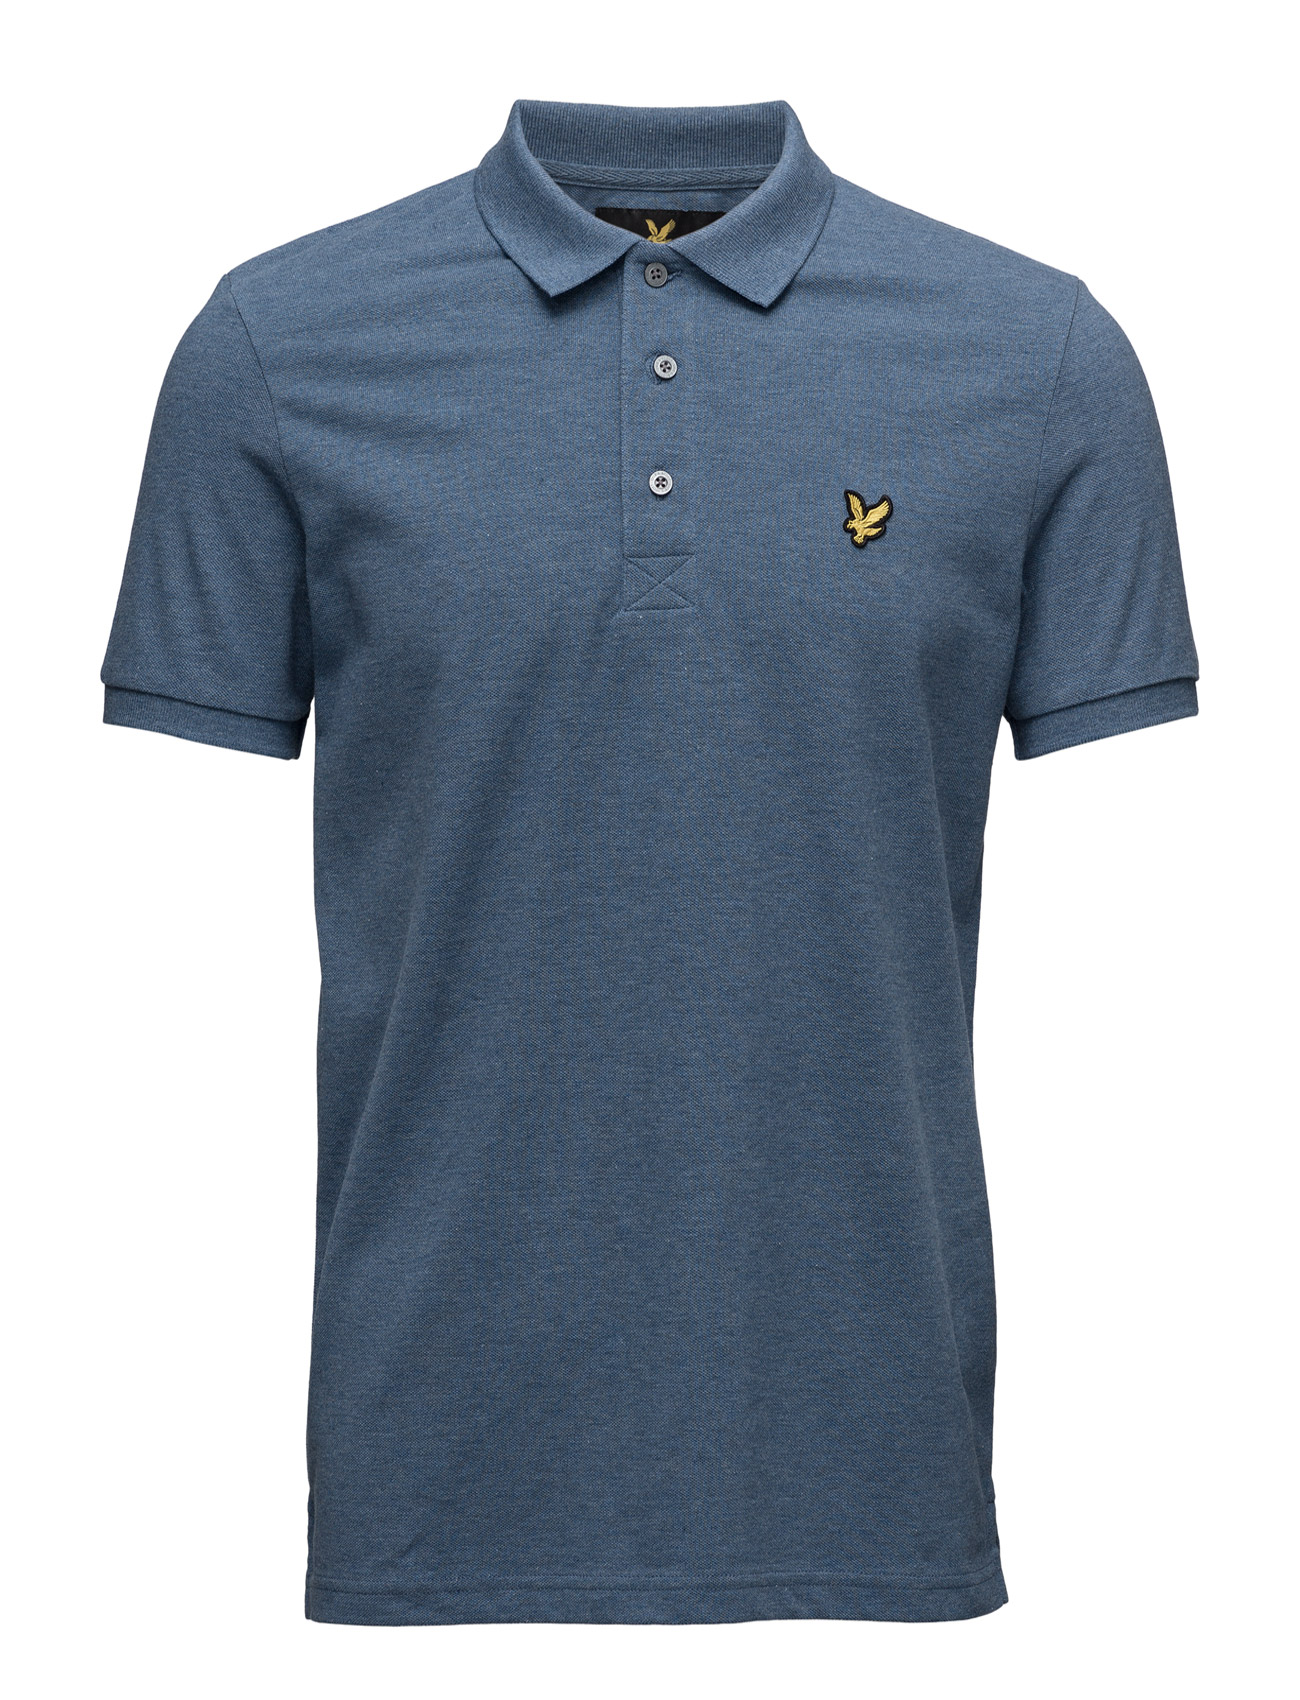 Polo Shirt Lyle & Scott Kortærmede polo t-shirts til Herrer i